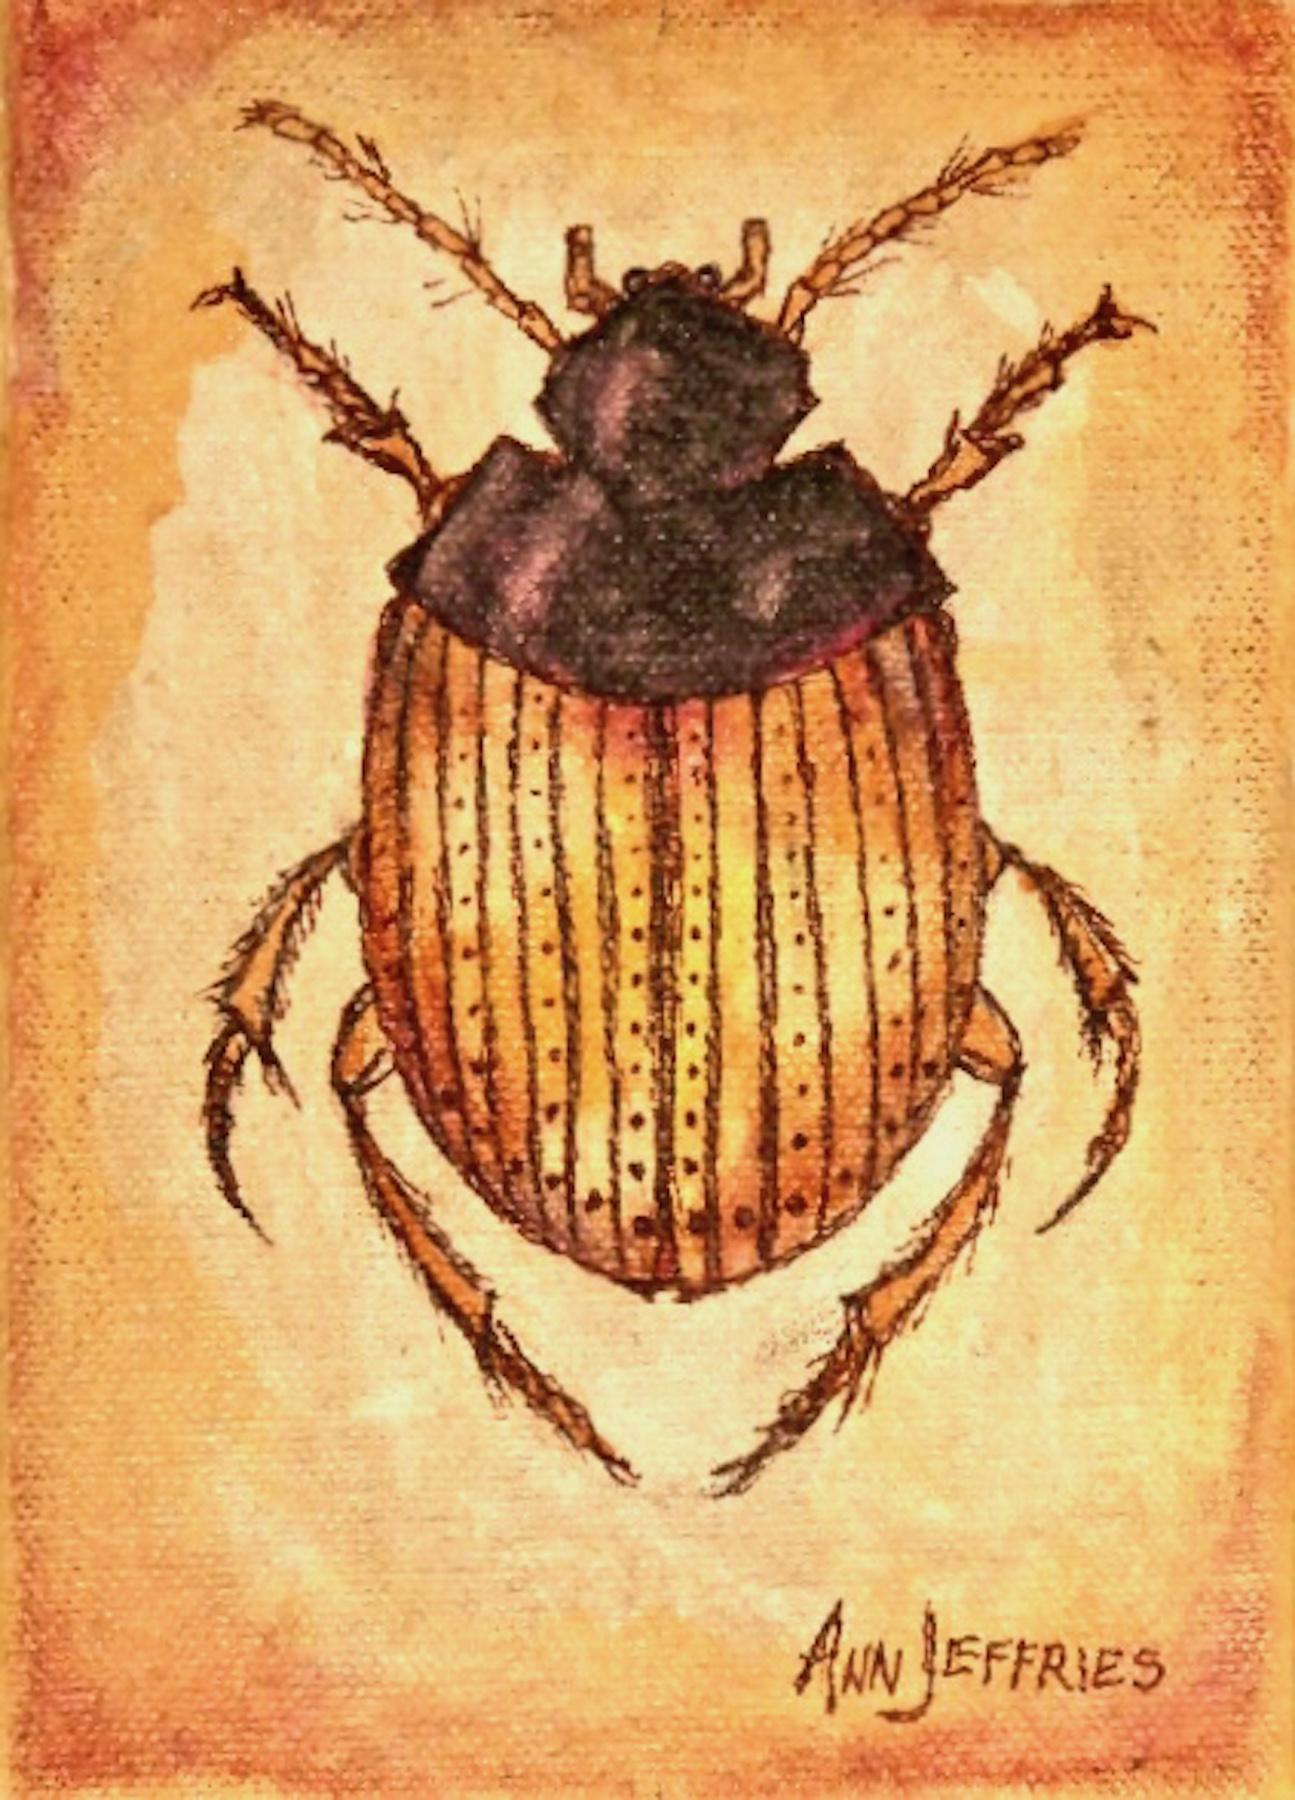 Ann Jeffries: Beetle (Coleoptera)